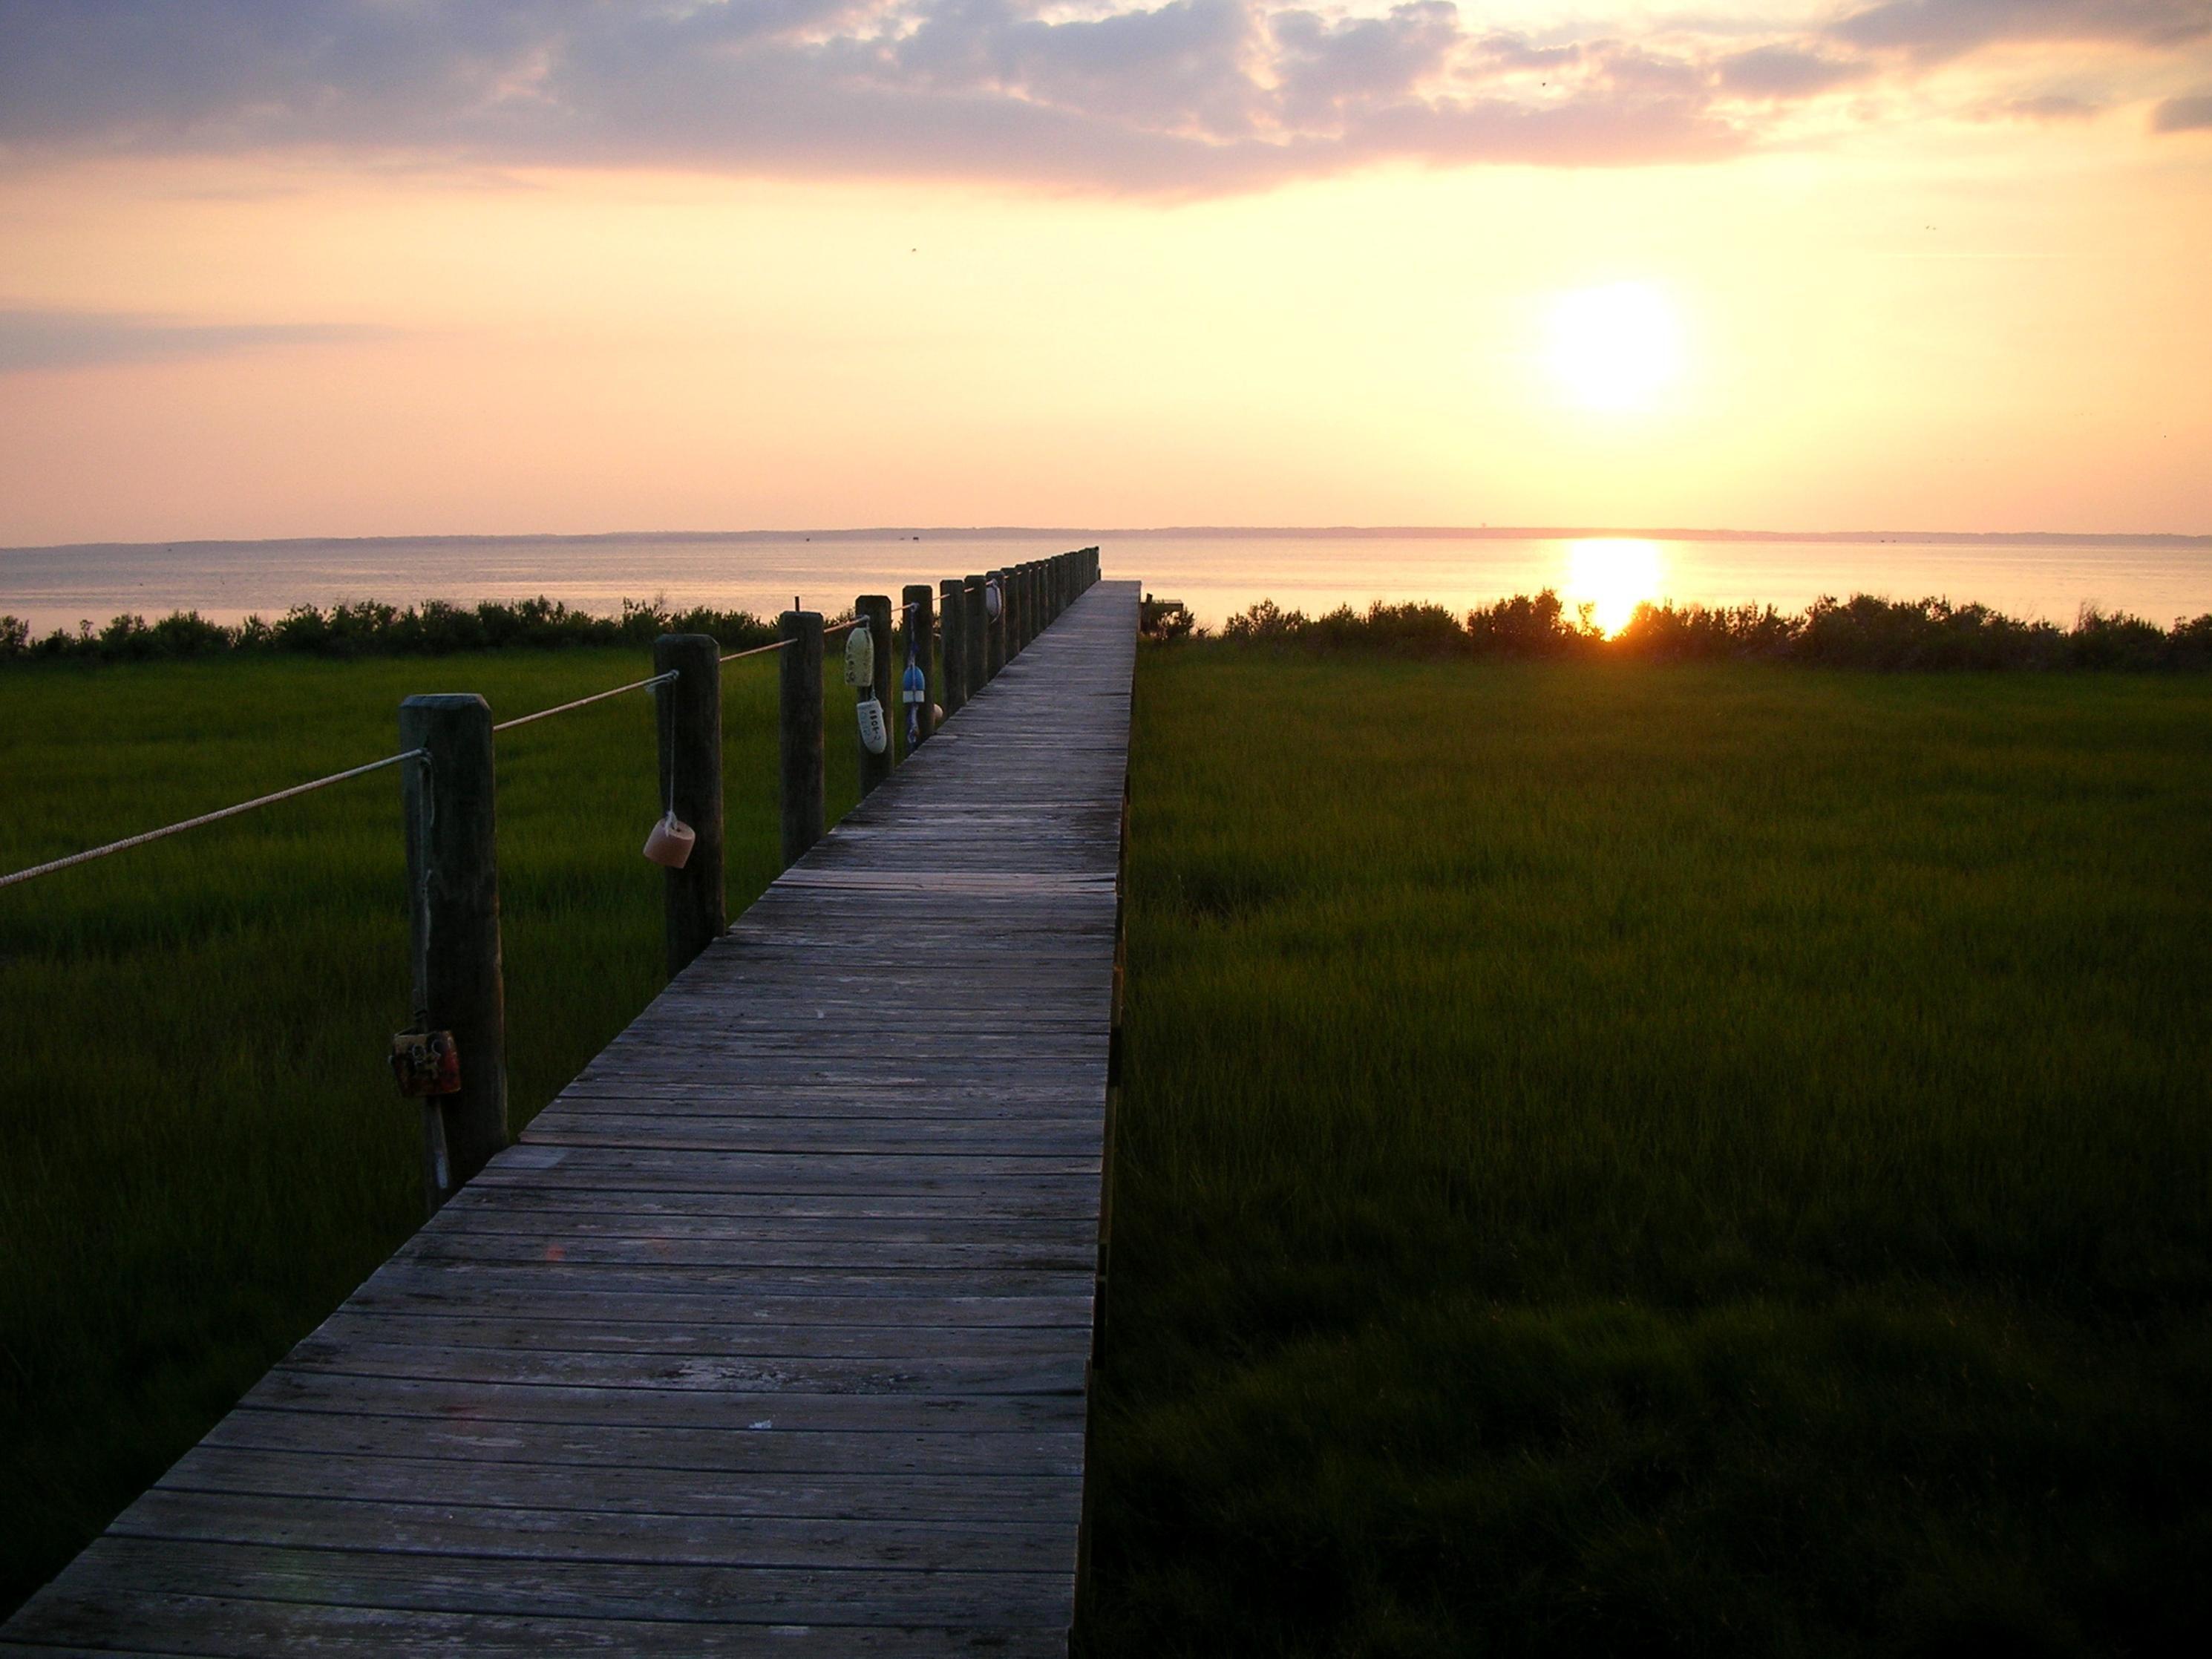 Free photograph; boardwalk, sunset